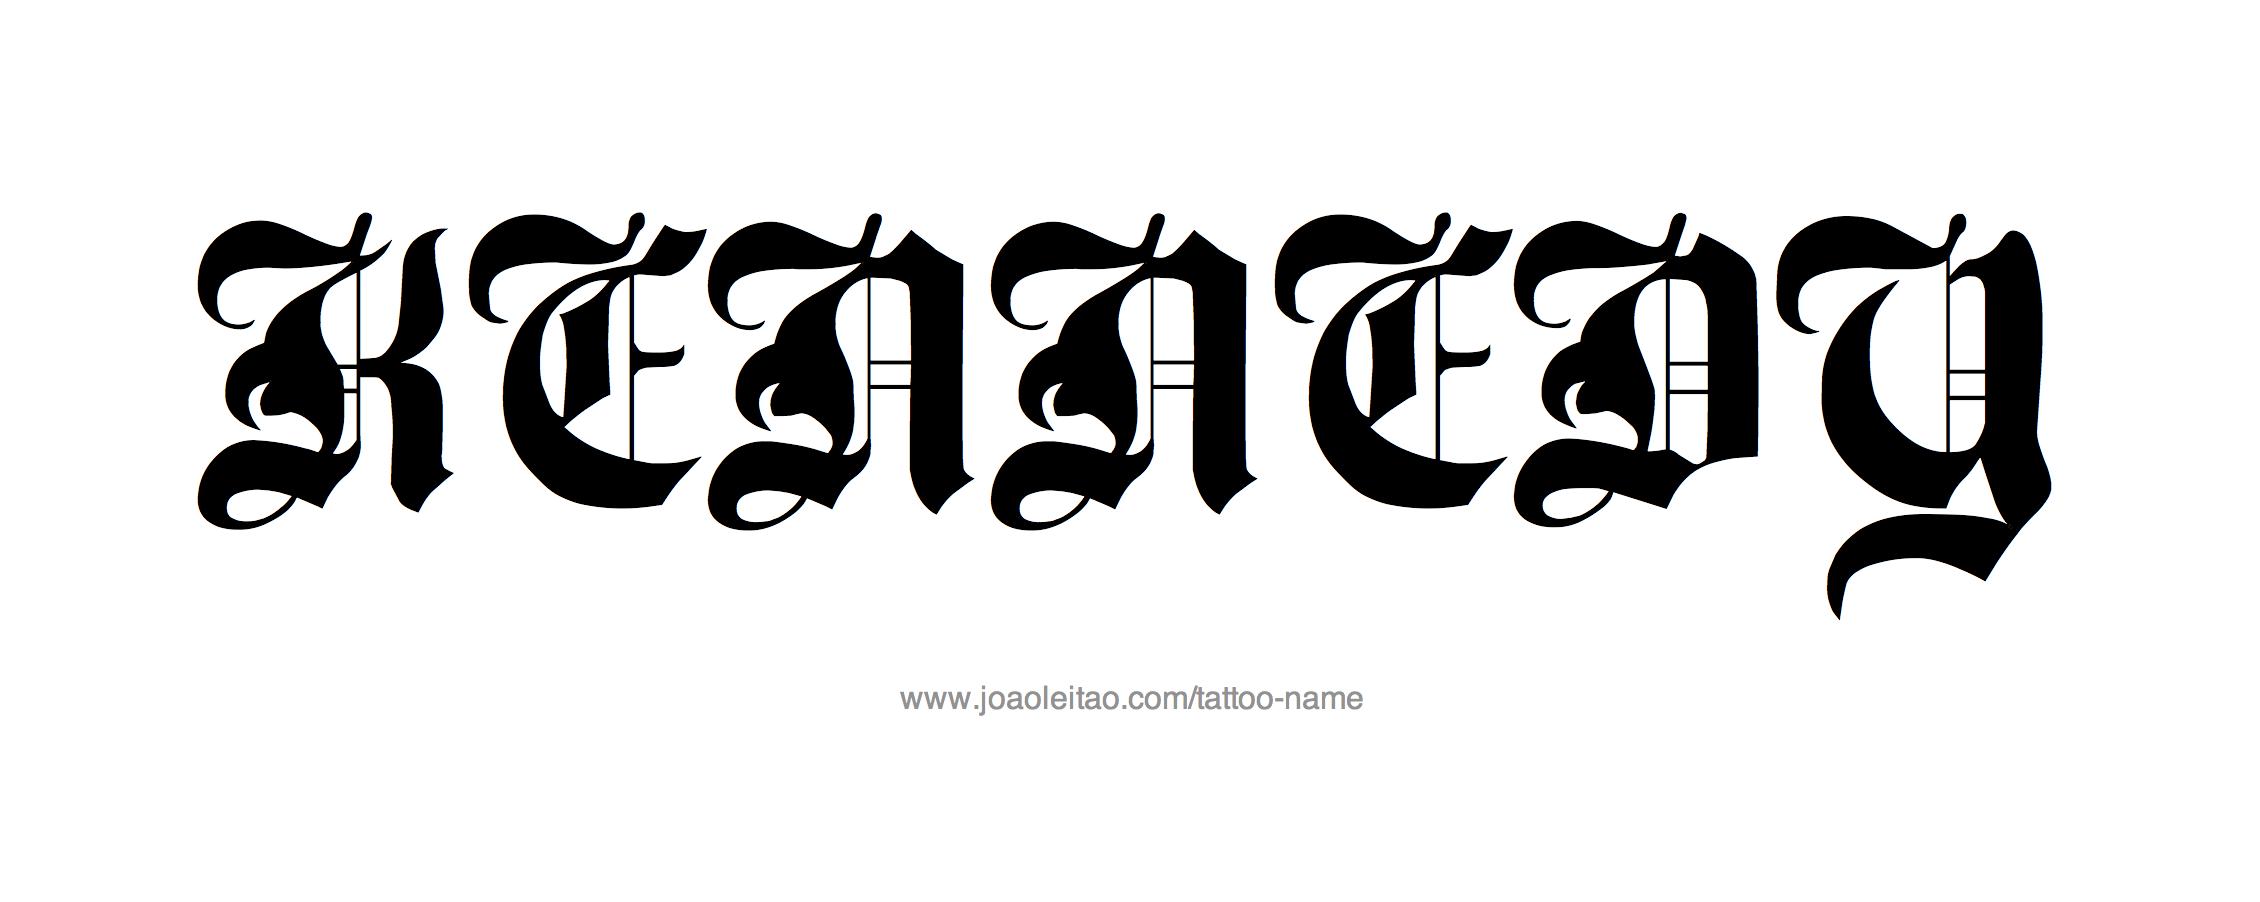 Top jfk jr tattoo images for pinterest tattoos for Pol junior design